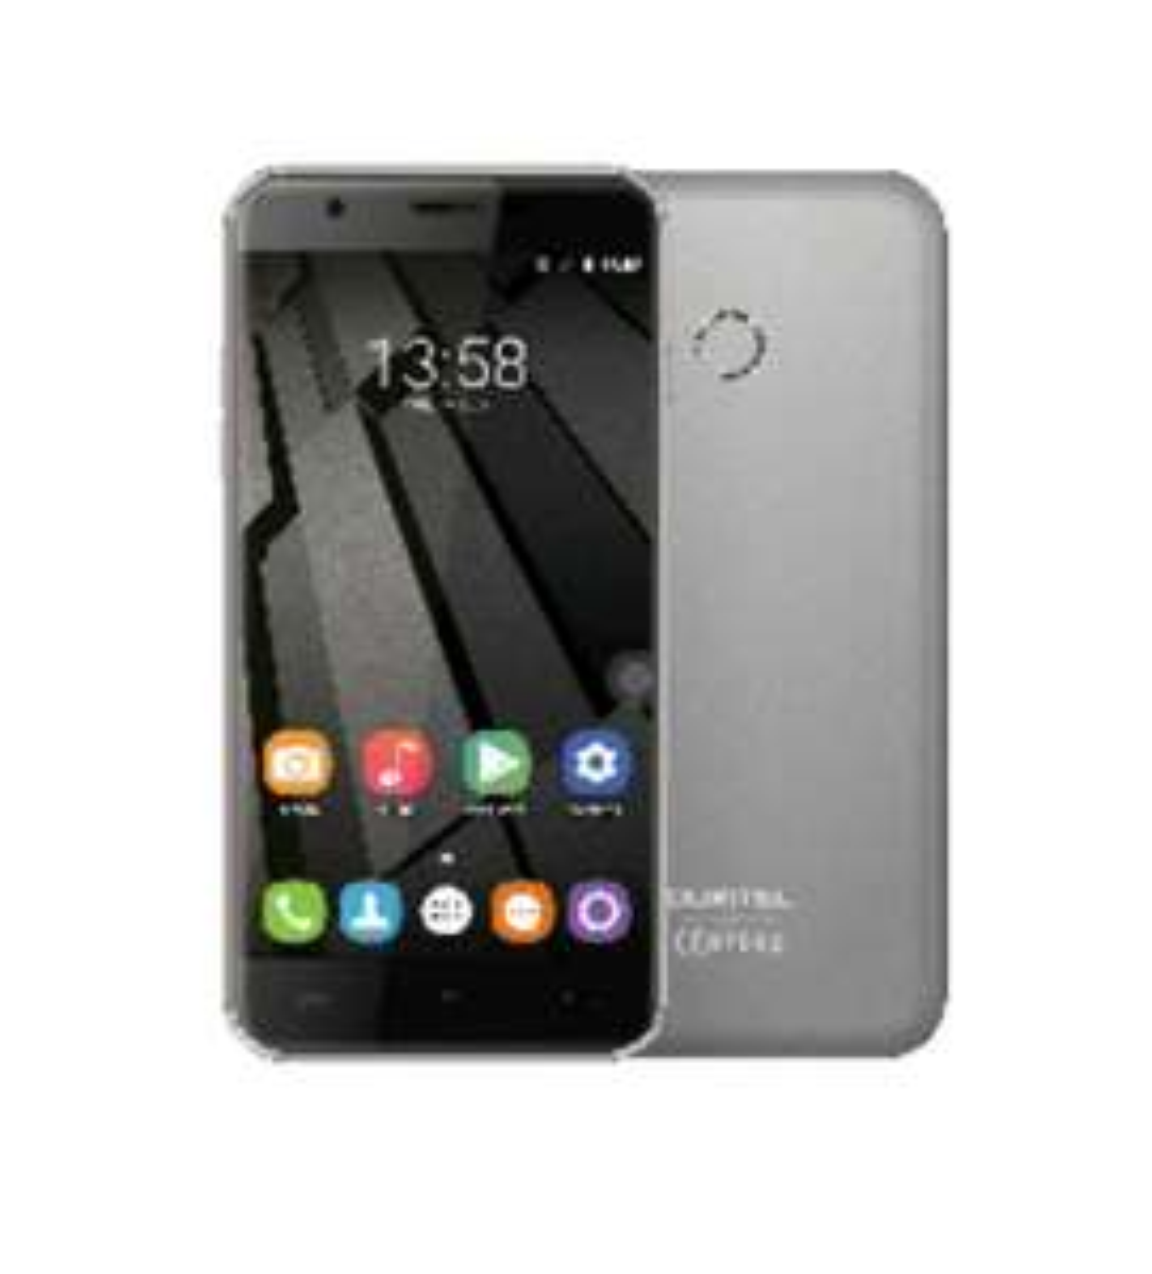 OUKITEL U7 Plus 4G FDD-LTE Smartphone 5.5inch HD-Bildschirm Android 6.0 Quad Core 1.3GHz 2GB RAM+16GB ROM OS 13.0MP Kamera 2500mAh-Akku Fingerabdruck Bluetooth 4.0